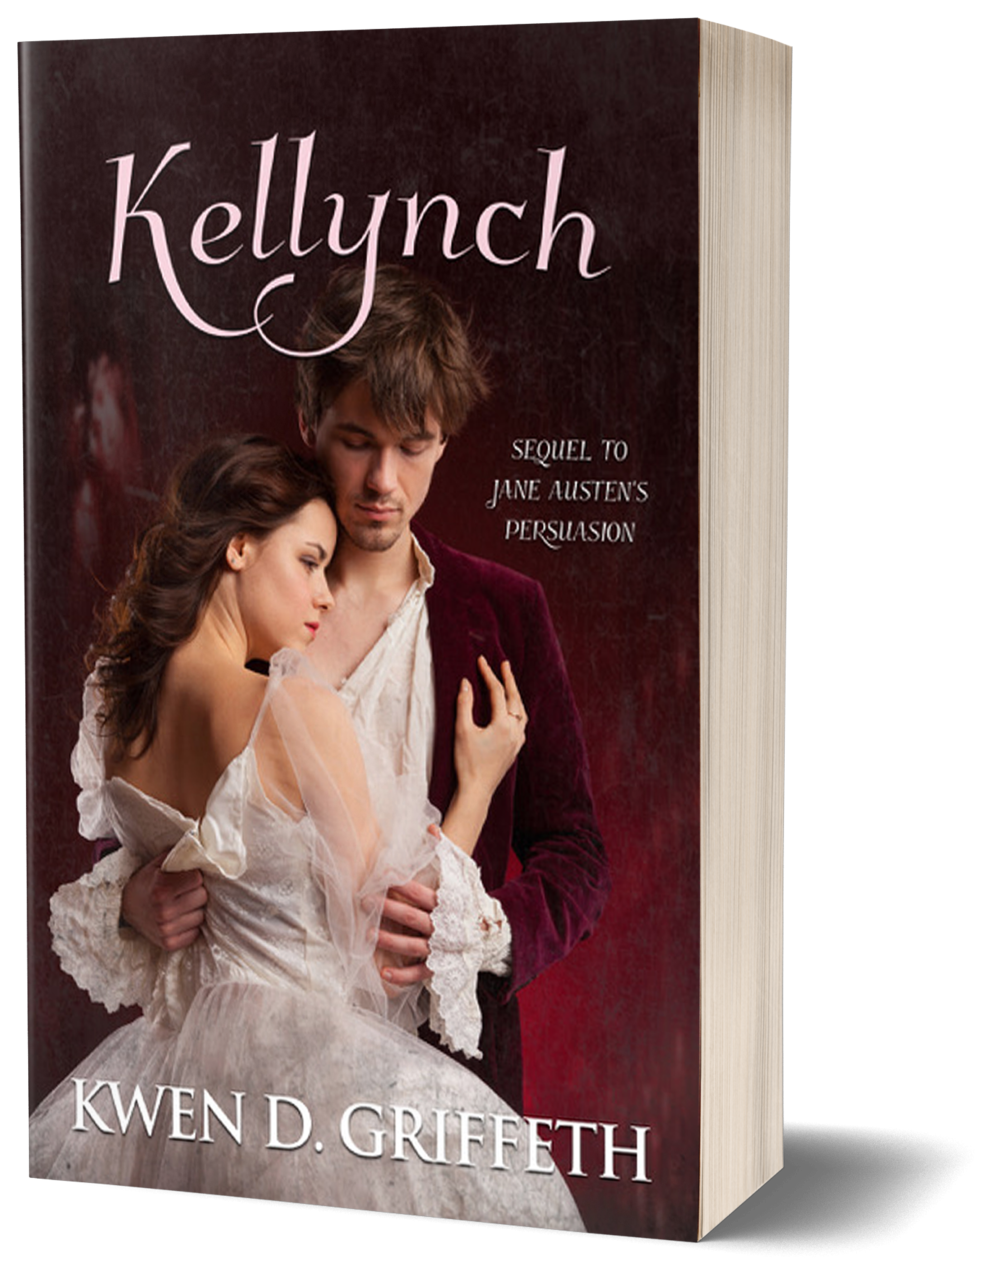 kellynch book mockup.png